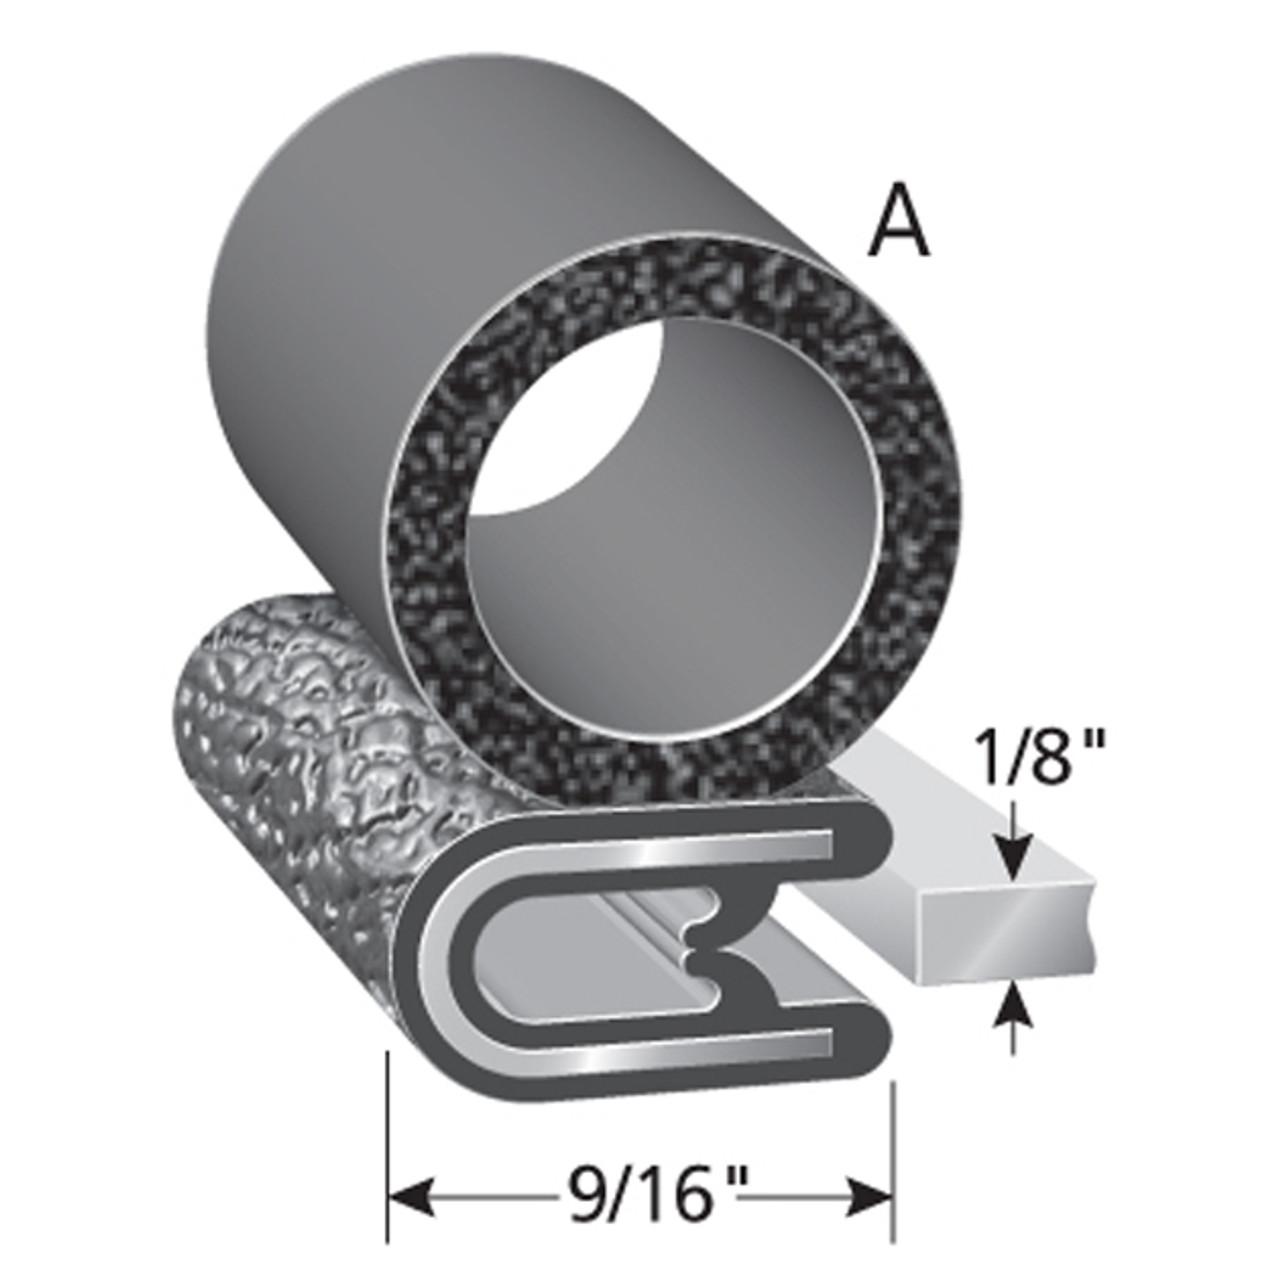 "Bulb Location ""A"" /  Bulb Diameter - 5/8"" /  Fits up to a 1/8"" Edge /  Leg Length of 9/16"""